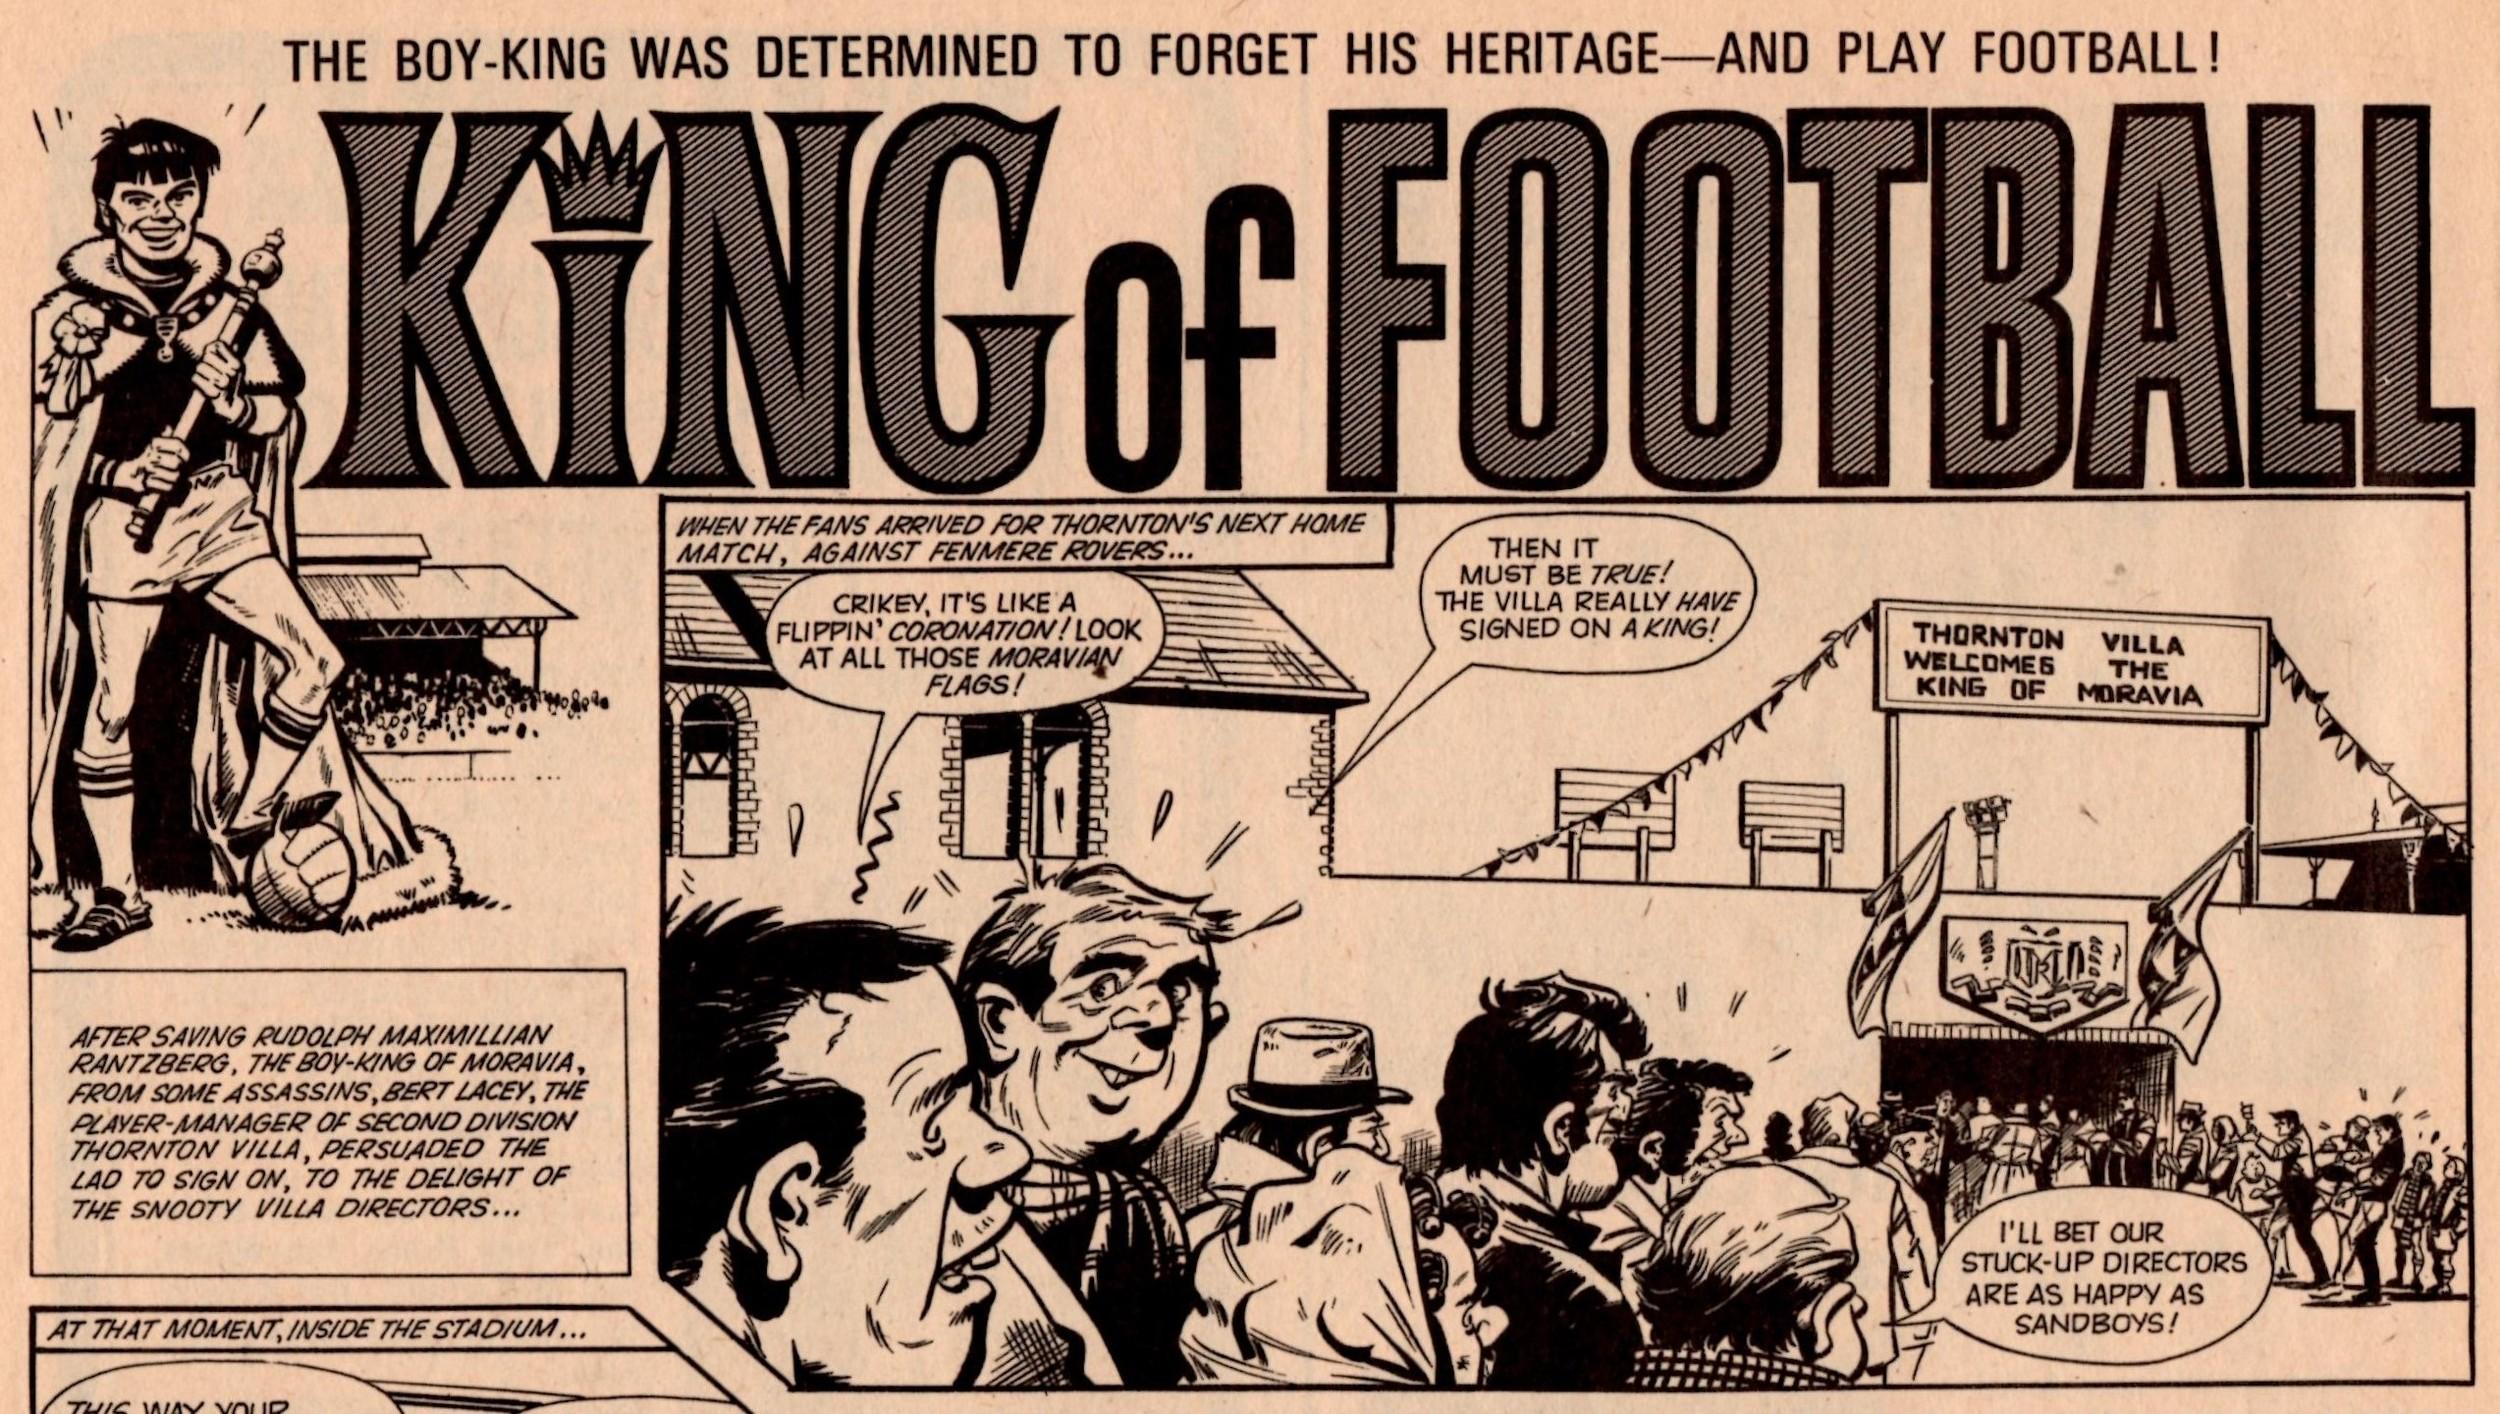 King of Football: Mike Western (artist)